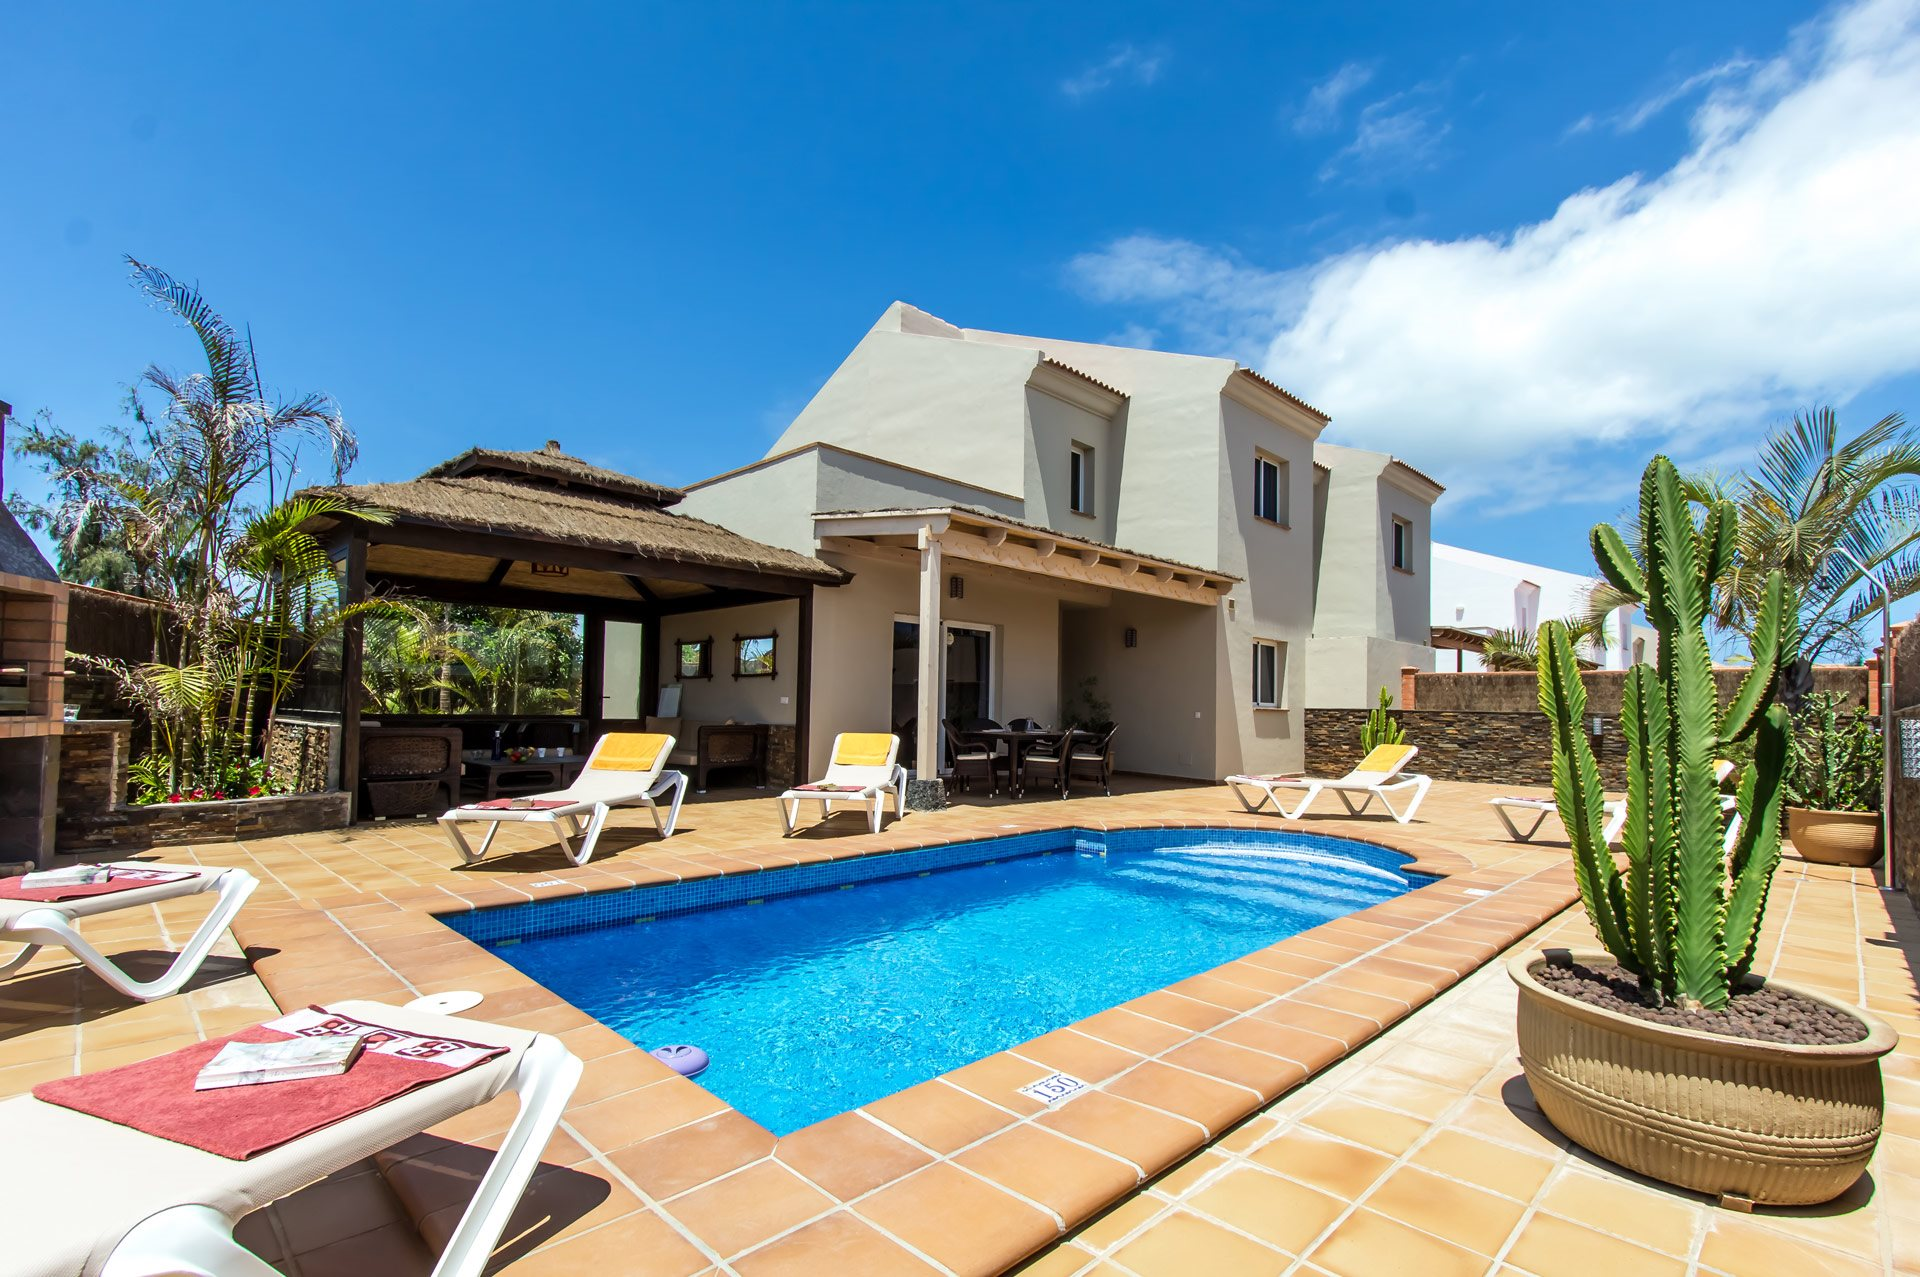 Villa Lisa, Corralejo, Fuerteventura